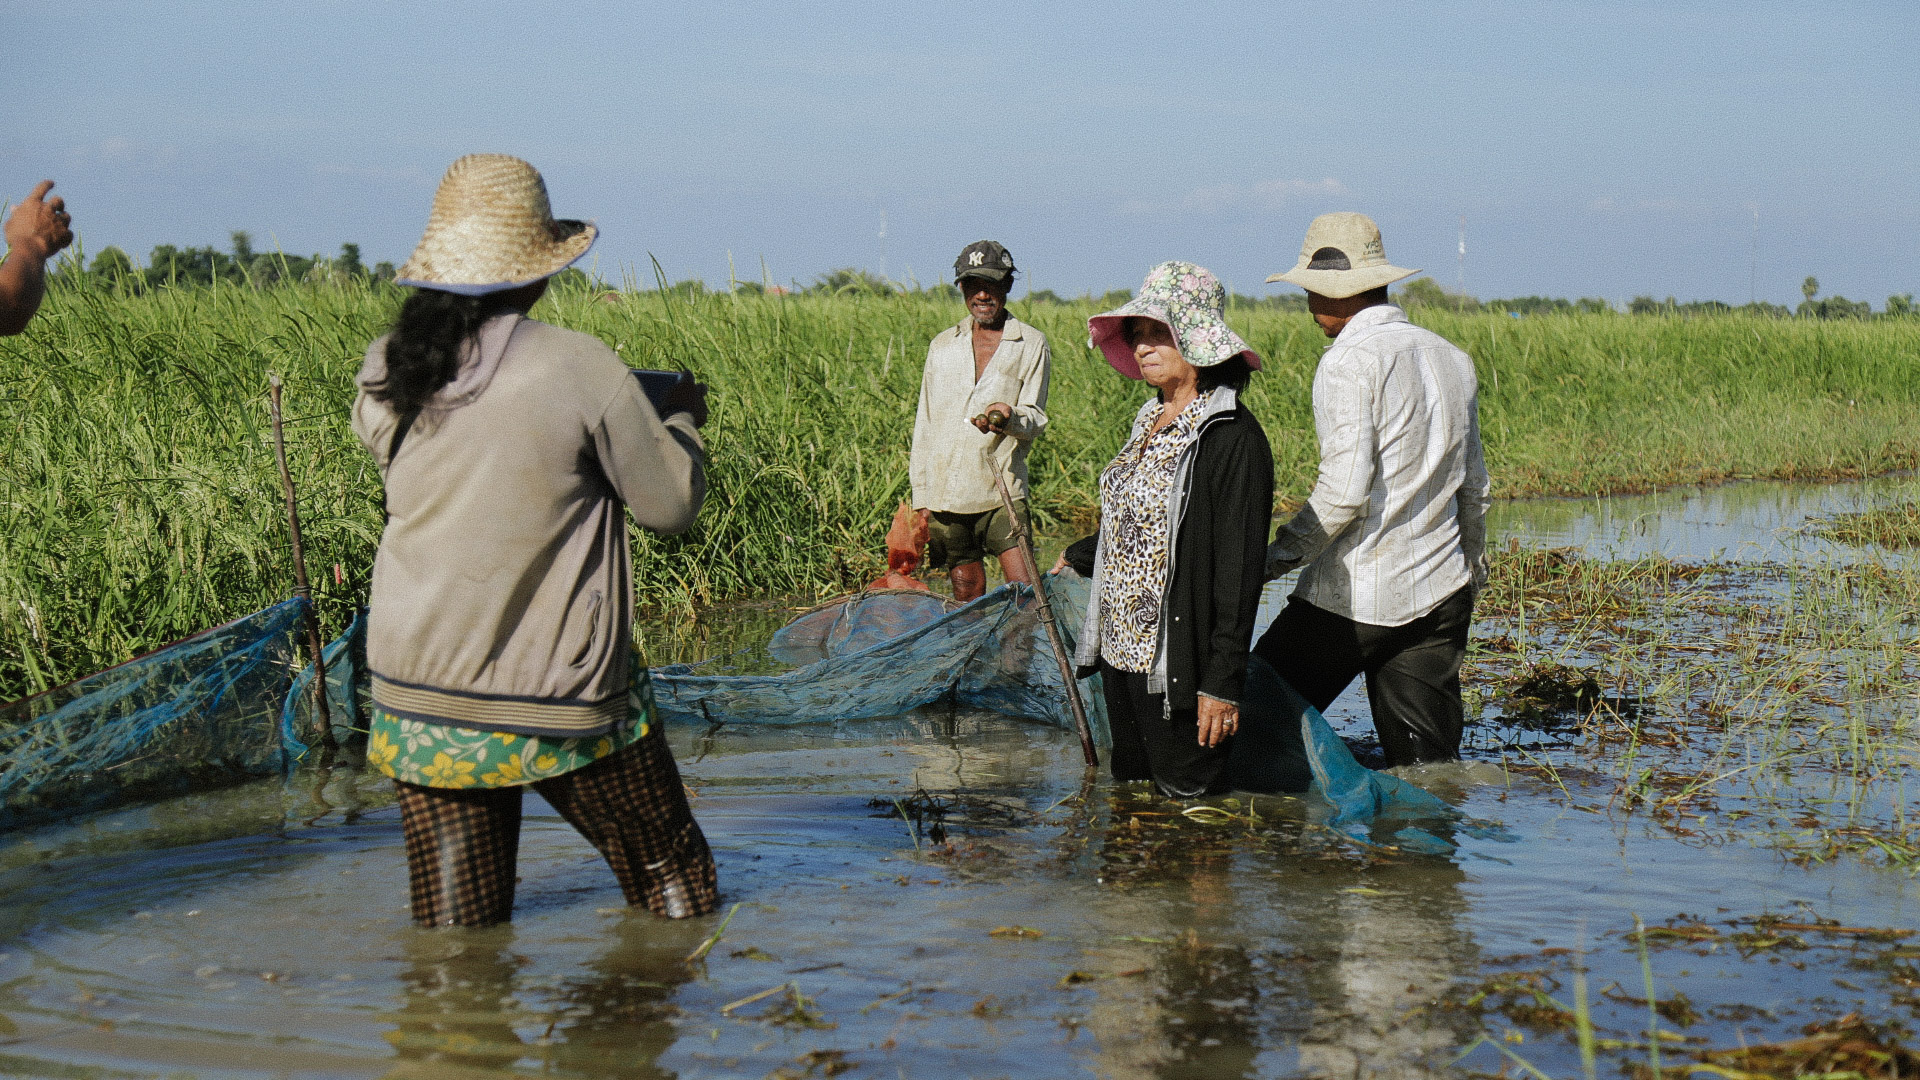 The Learning Institute_BakAmrek_Battambang_Cambodia_SEAFDEC 04